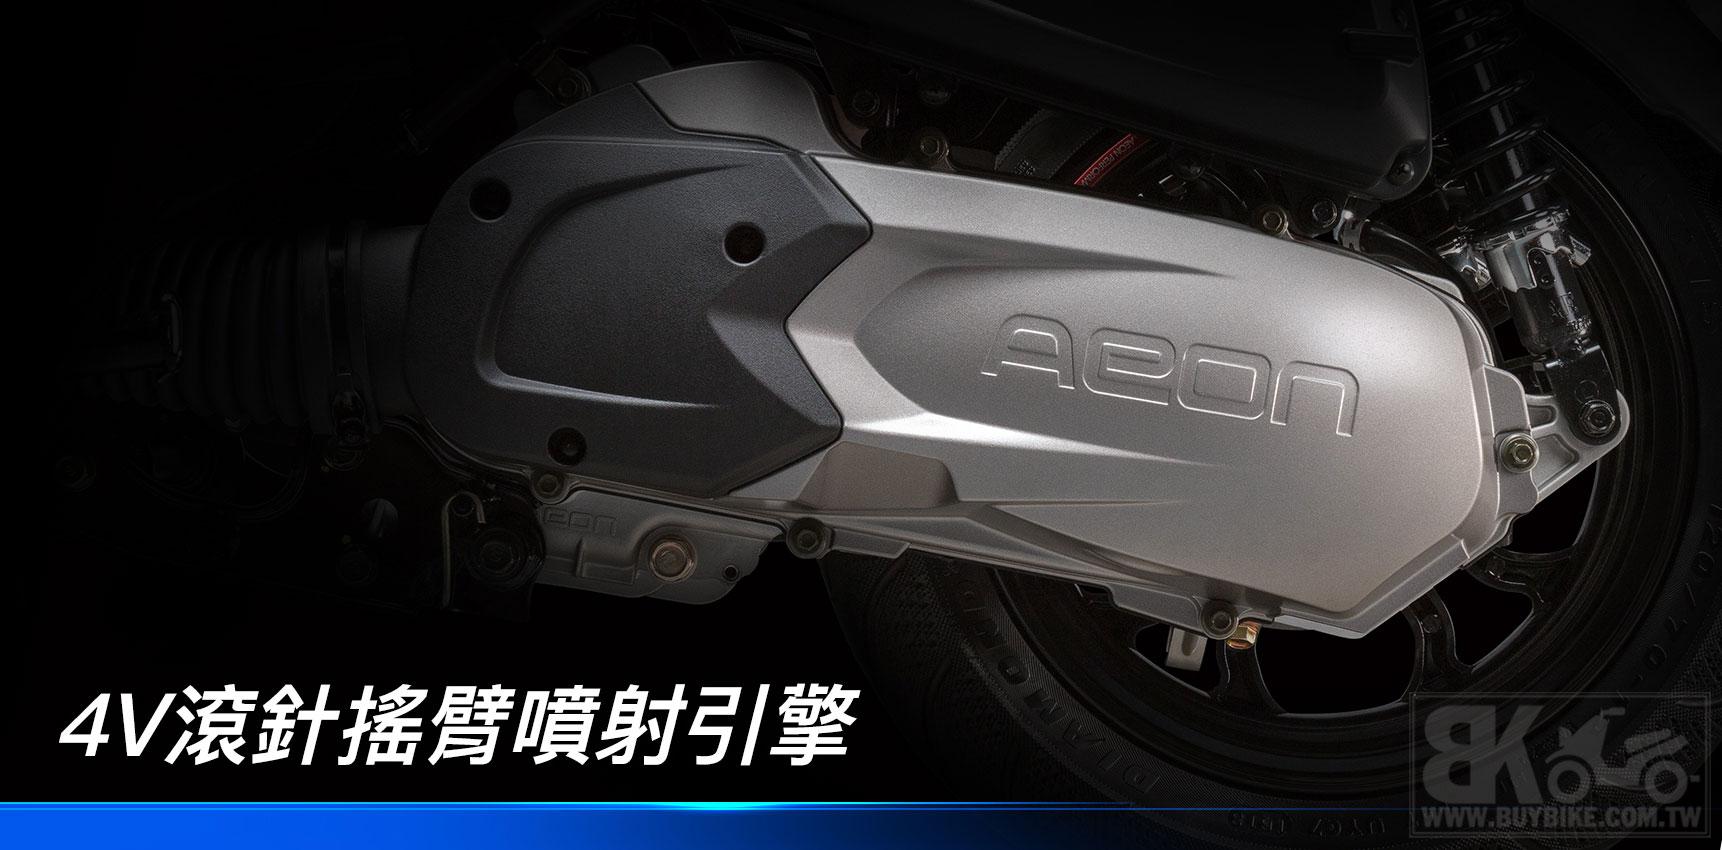 https://www.buybike.com.tw/wp-content/uploads/2020/04/USB%E5%85%85%E9%9B%BB%E5%BA%A7.jpg